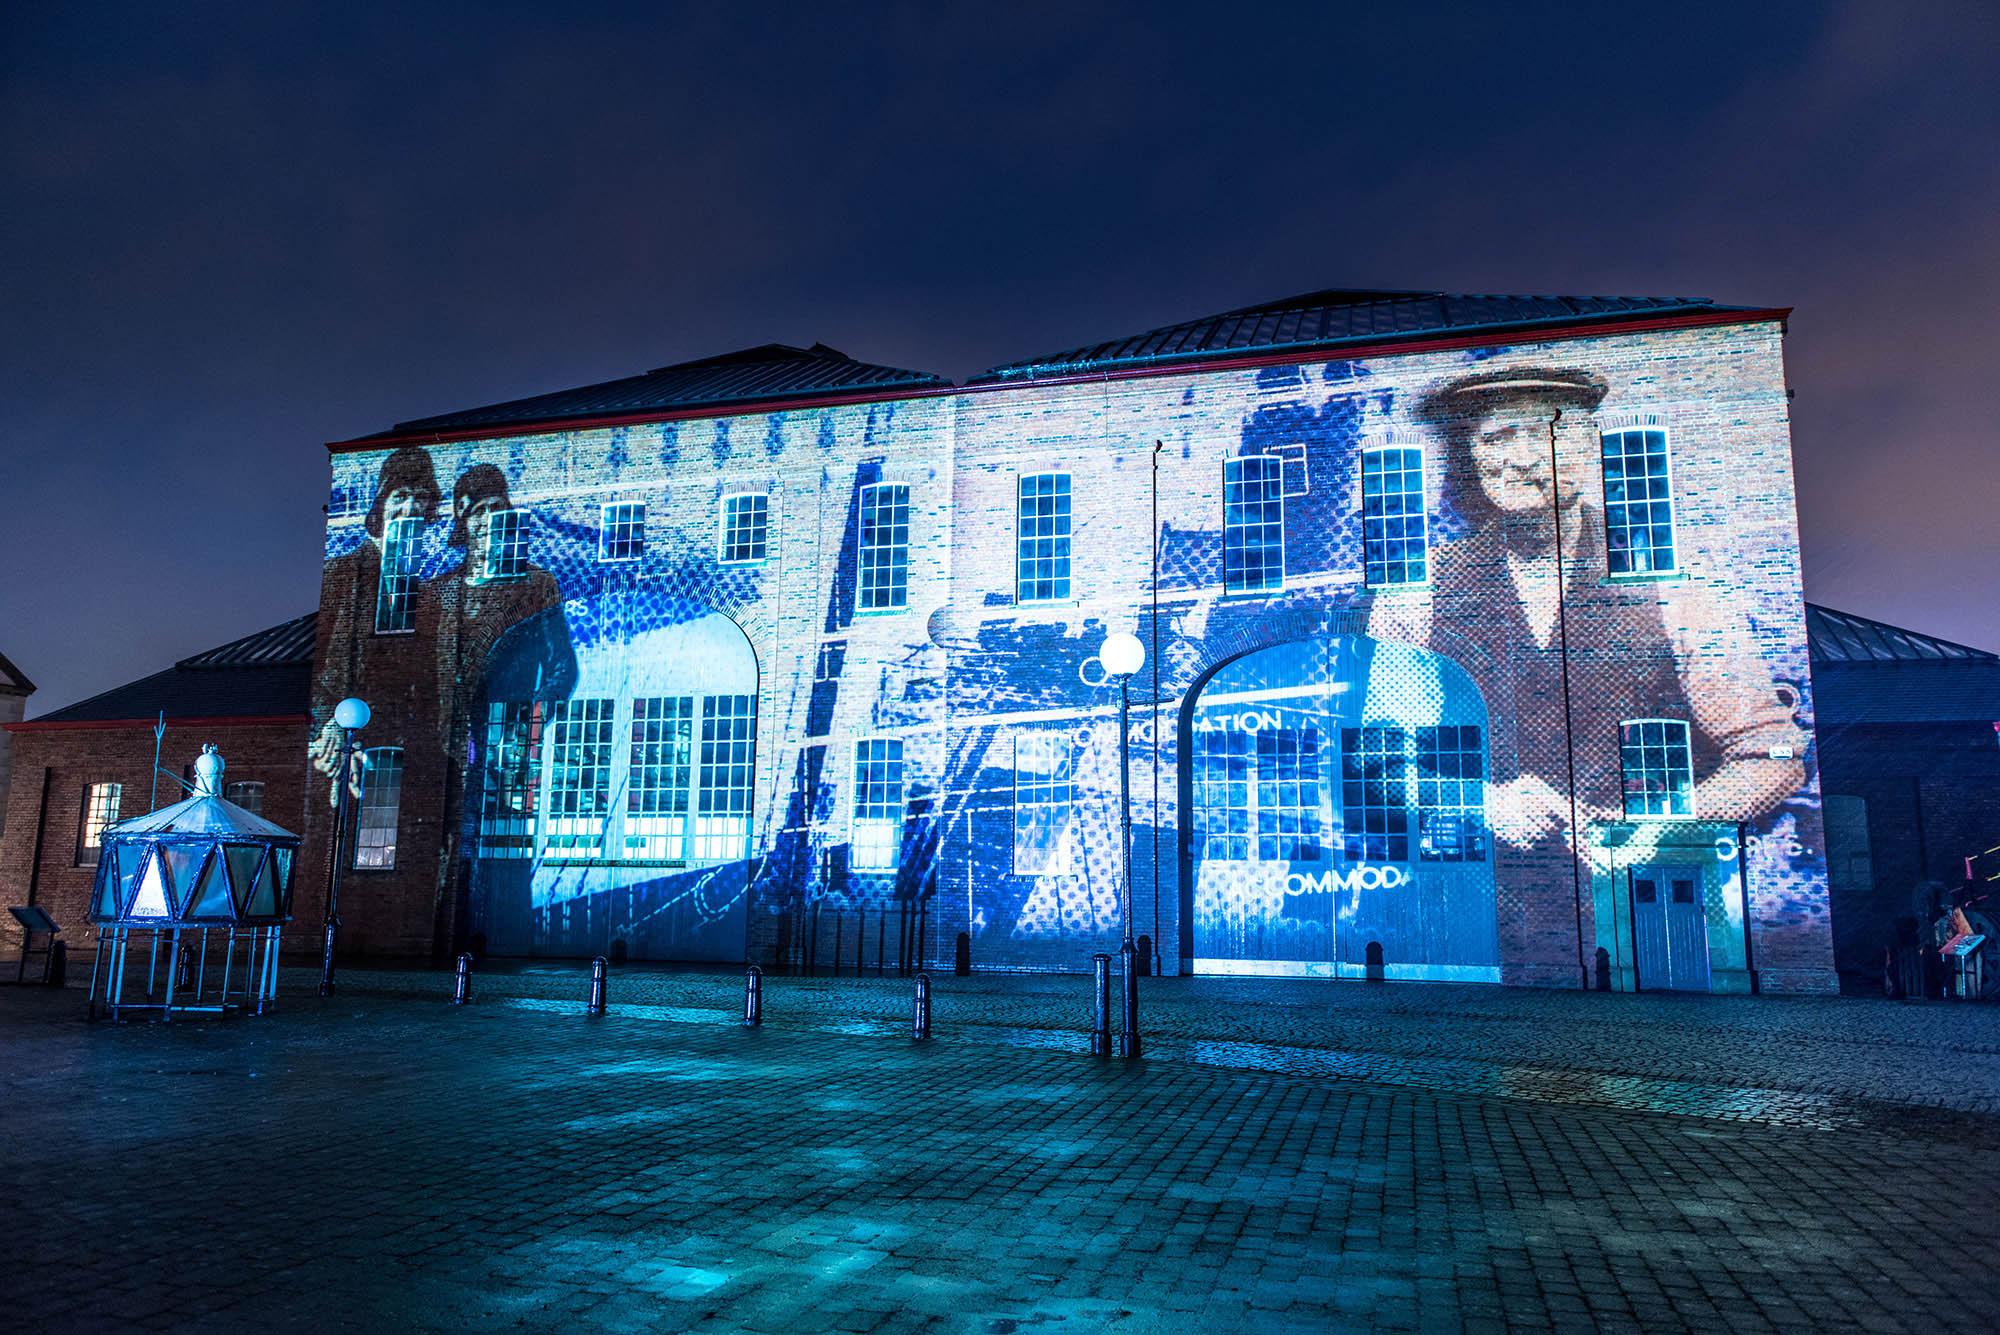 Illumination, Irvine Maritime Museum projection show, archive footage